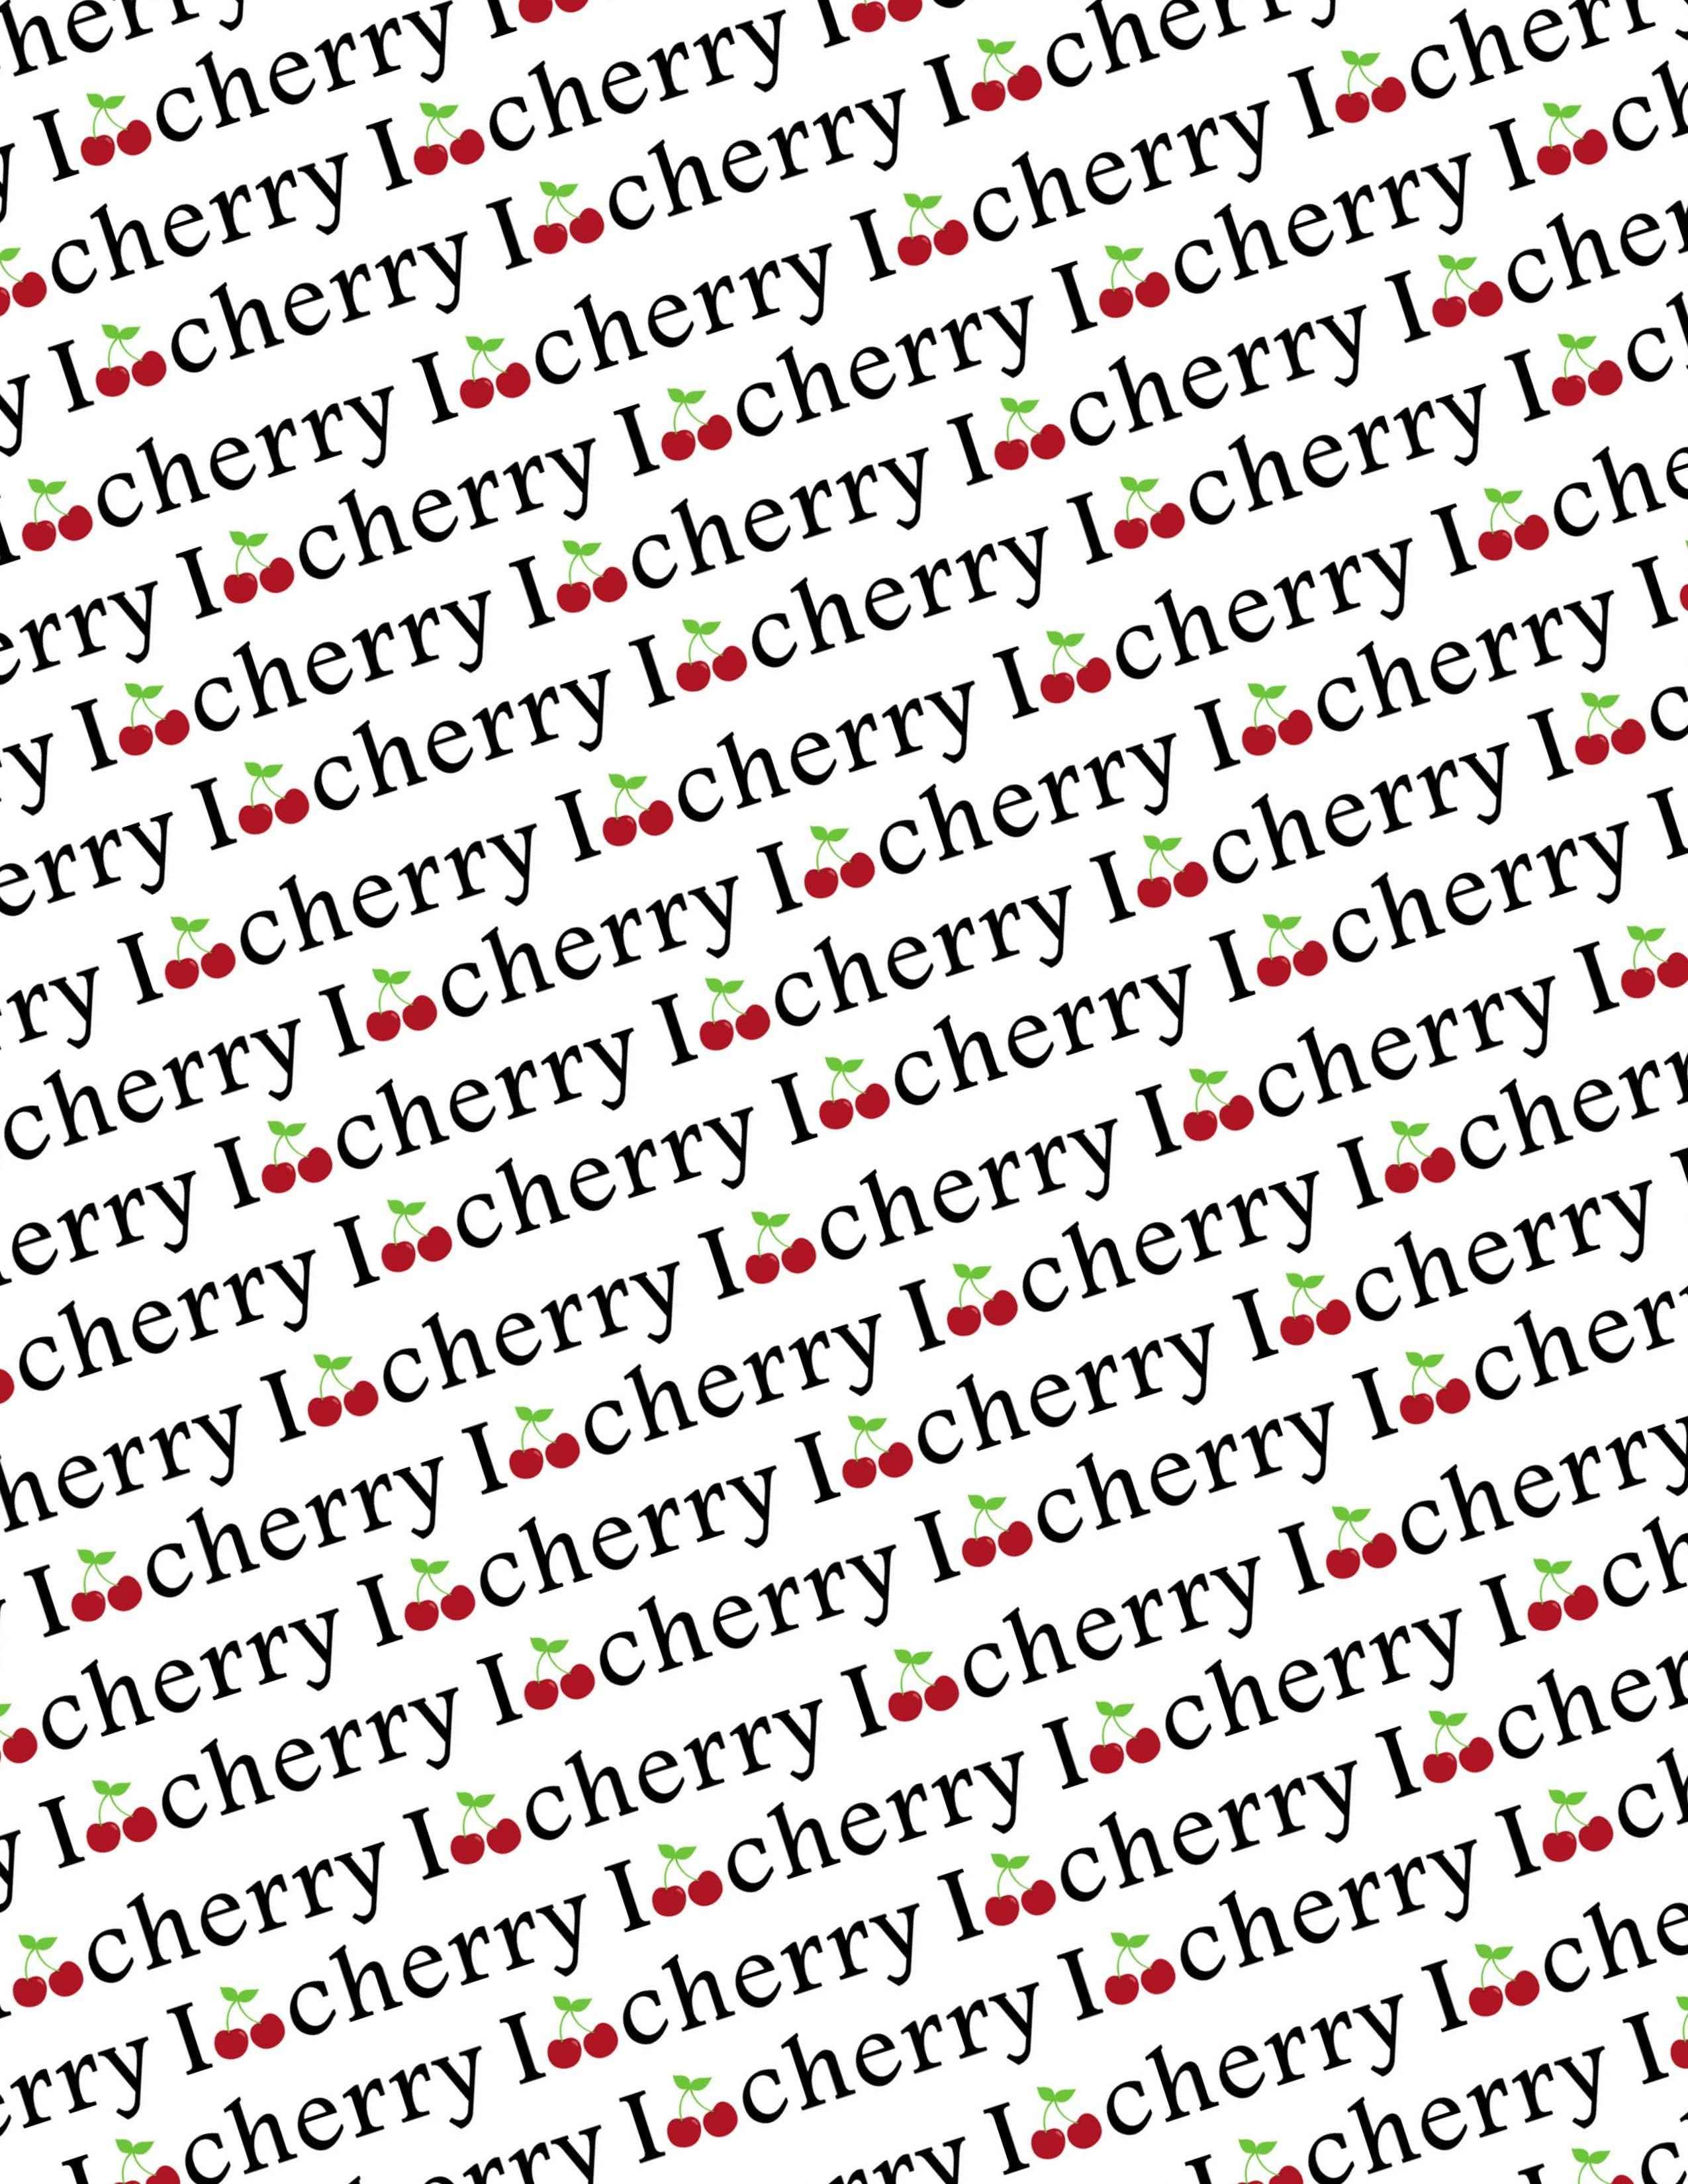 Coleccion cherry...jpg (2550×3300) Word search puzzle